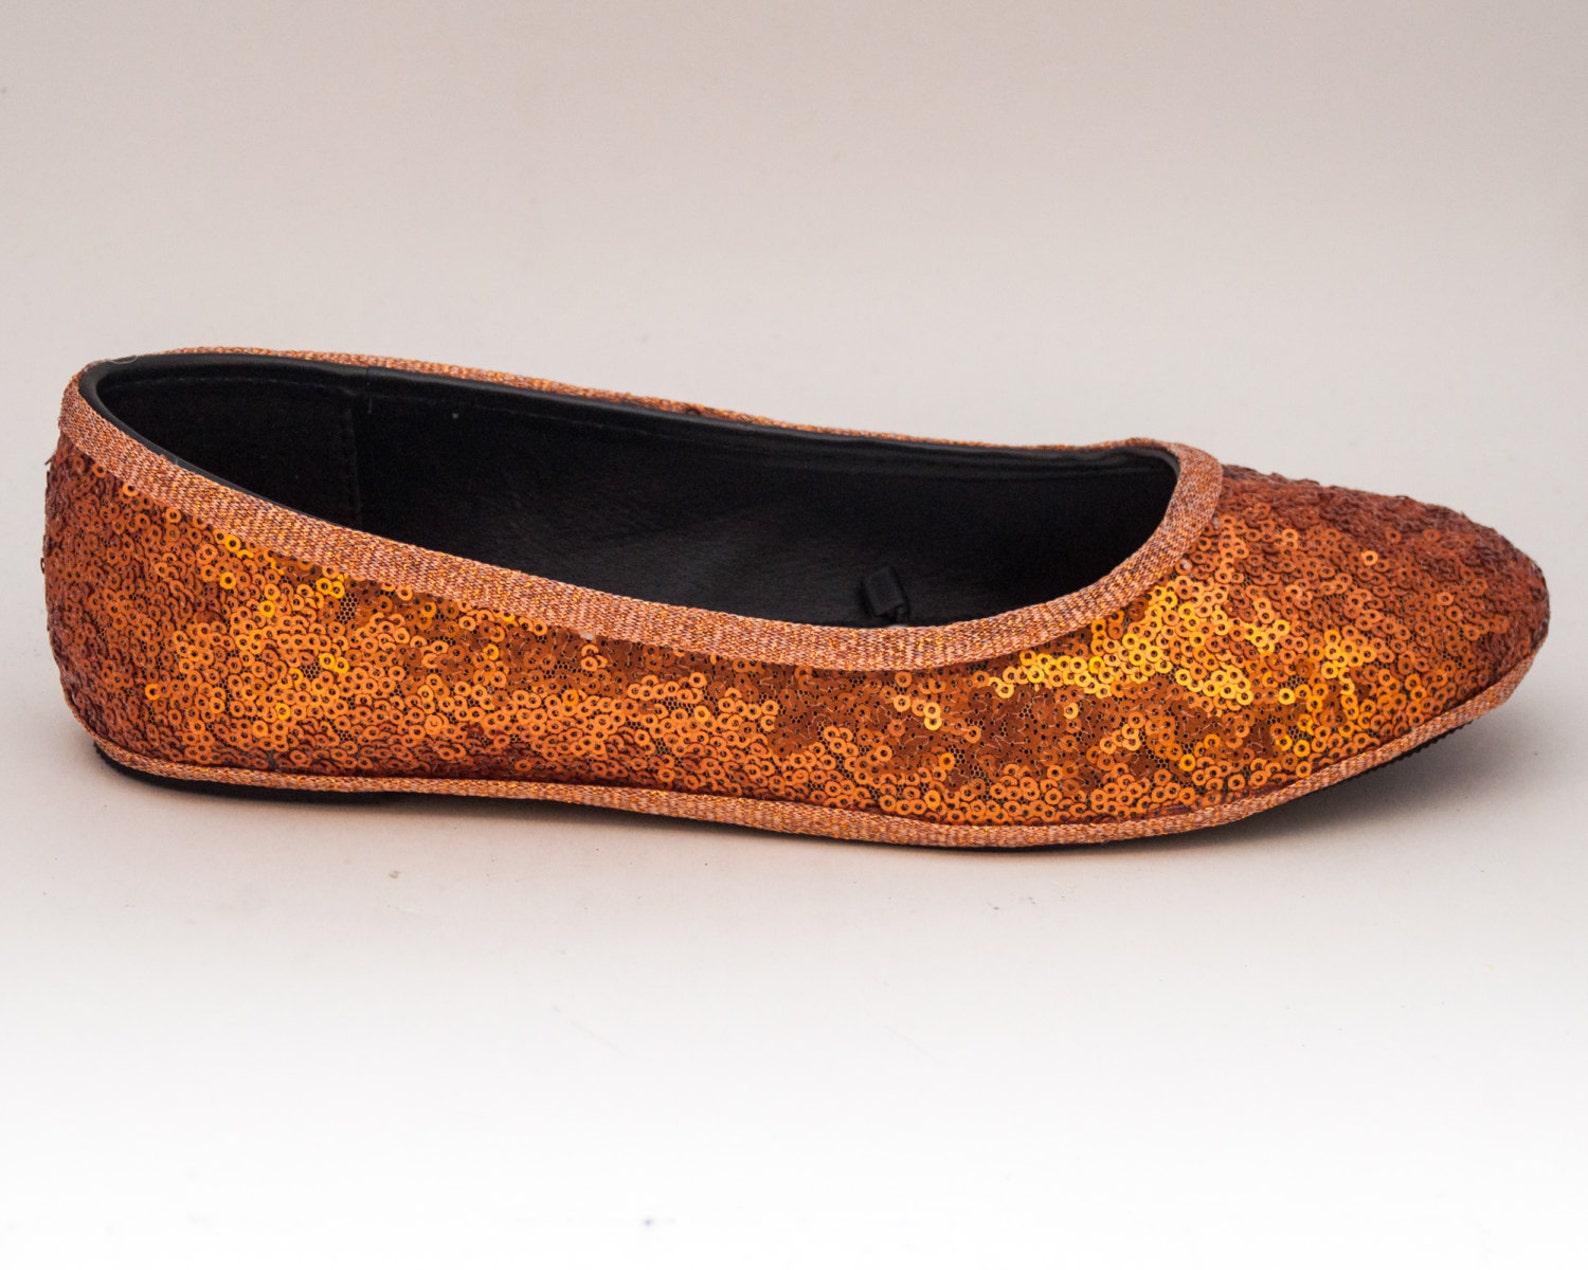 tiny sequin | starlight orange ballet flats slippers shoes